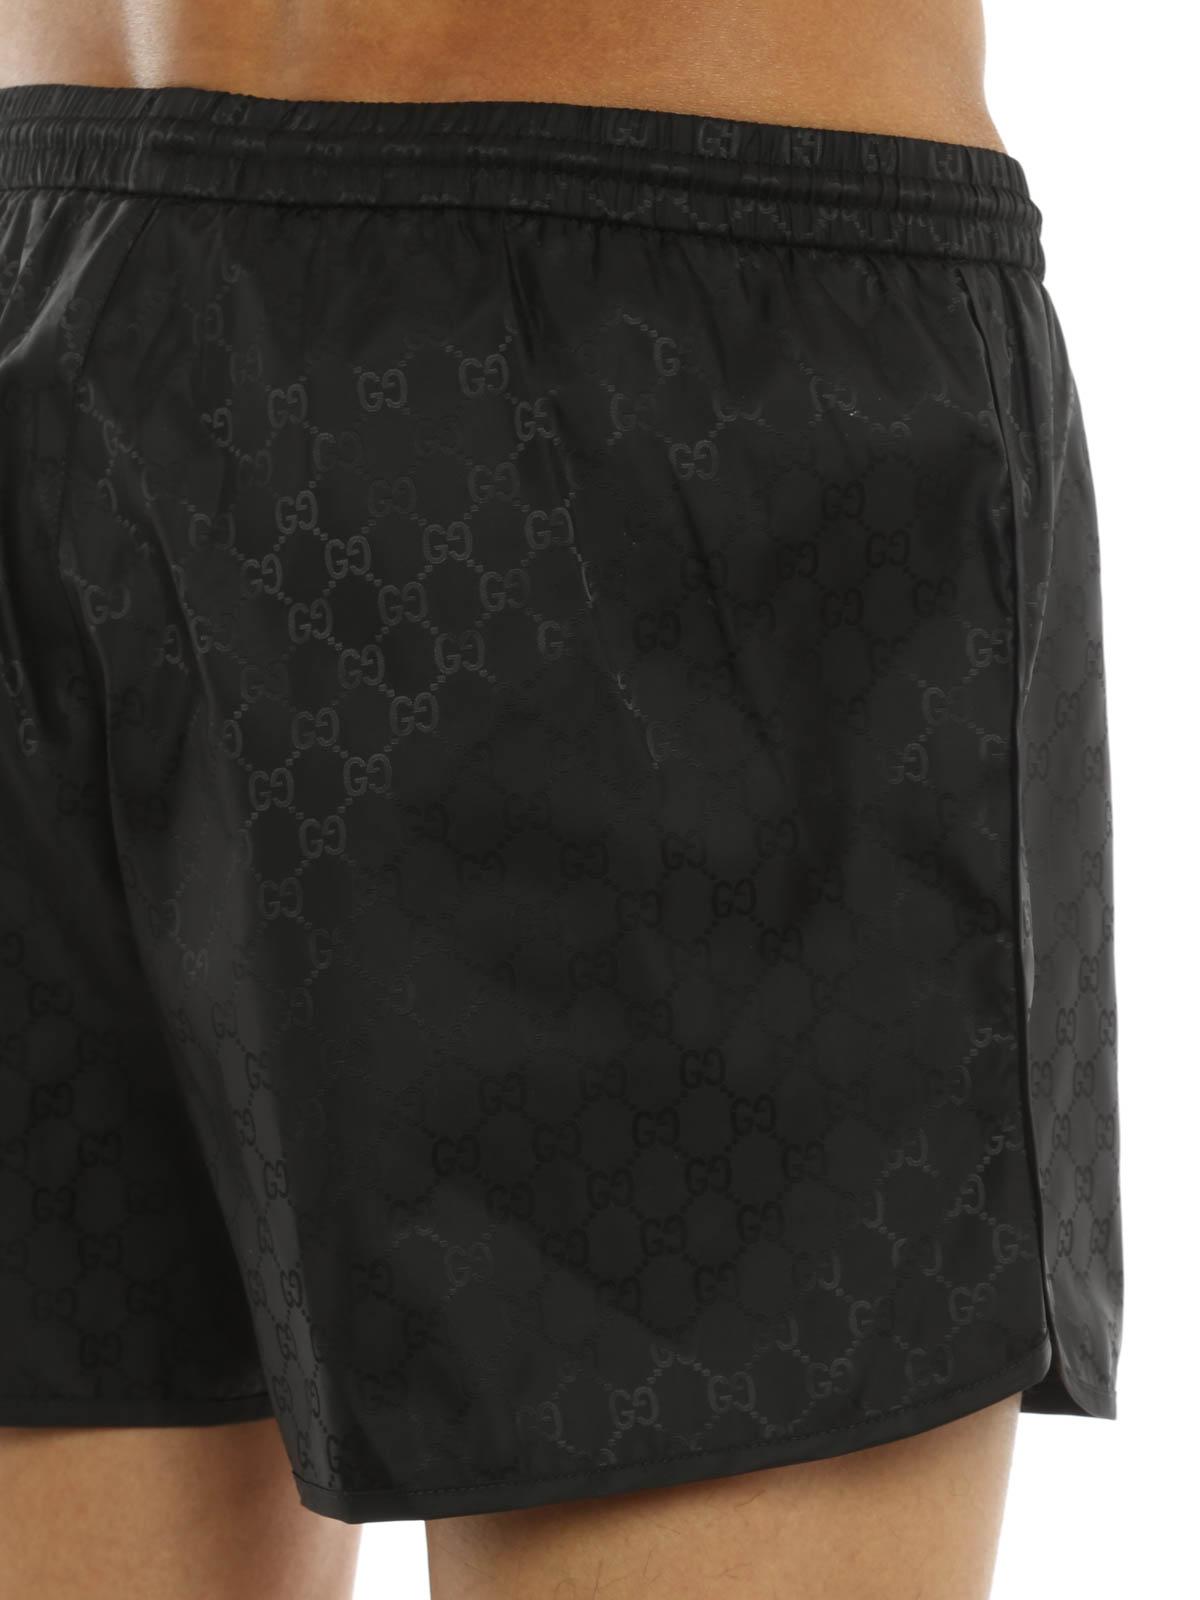 b557d8b23c Gucci - GG Supreme swim shorts - Swim shorts & swimming trunks ...